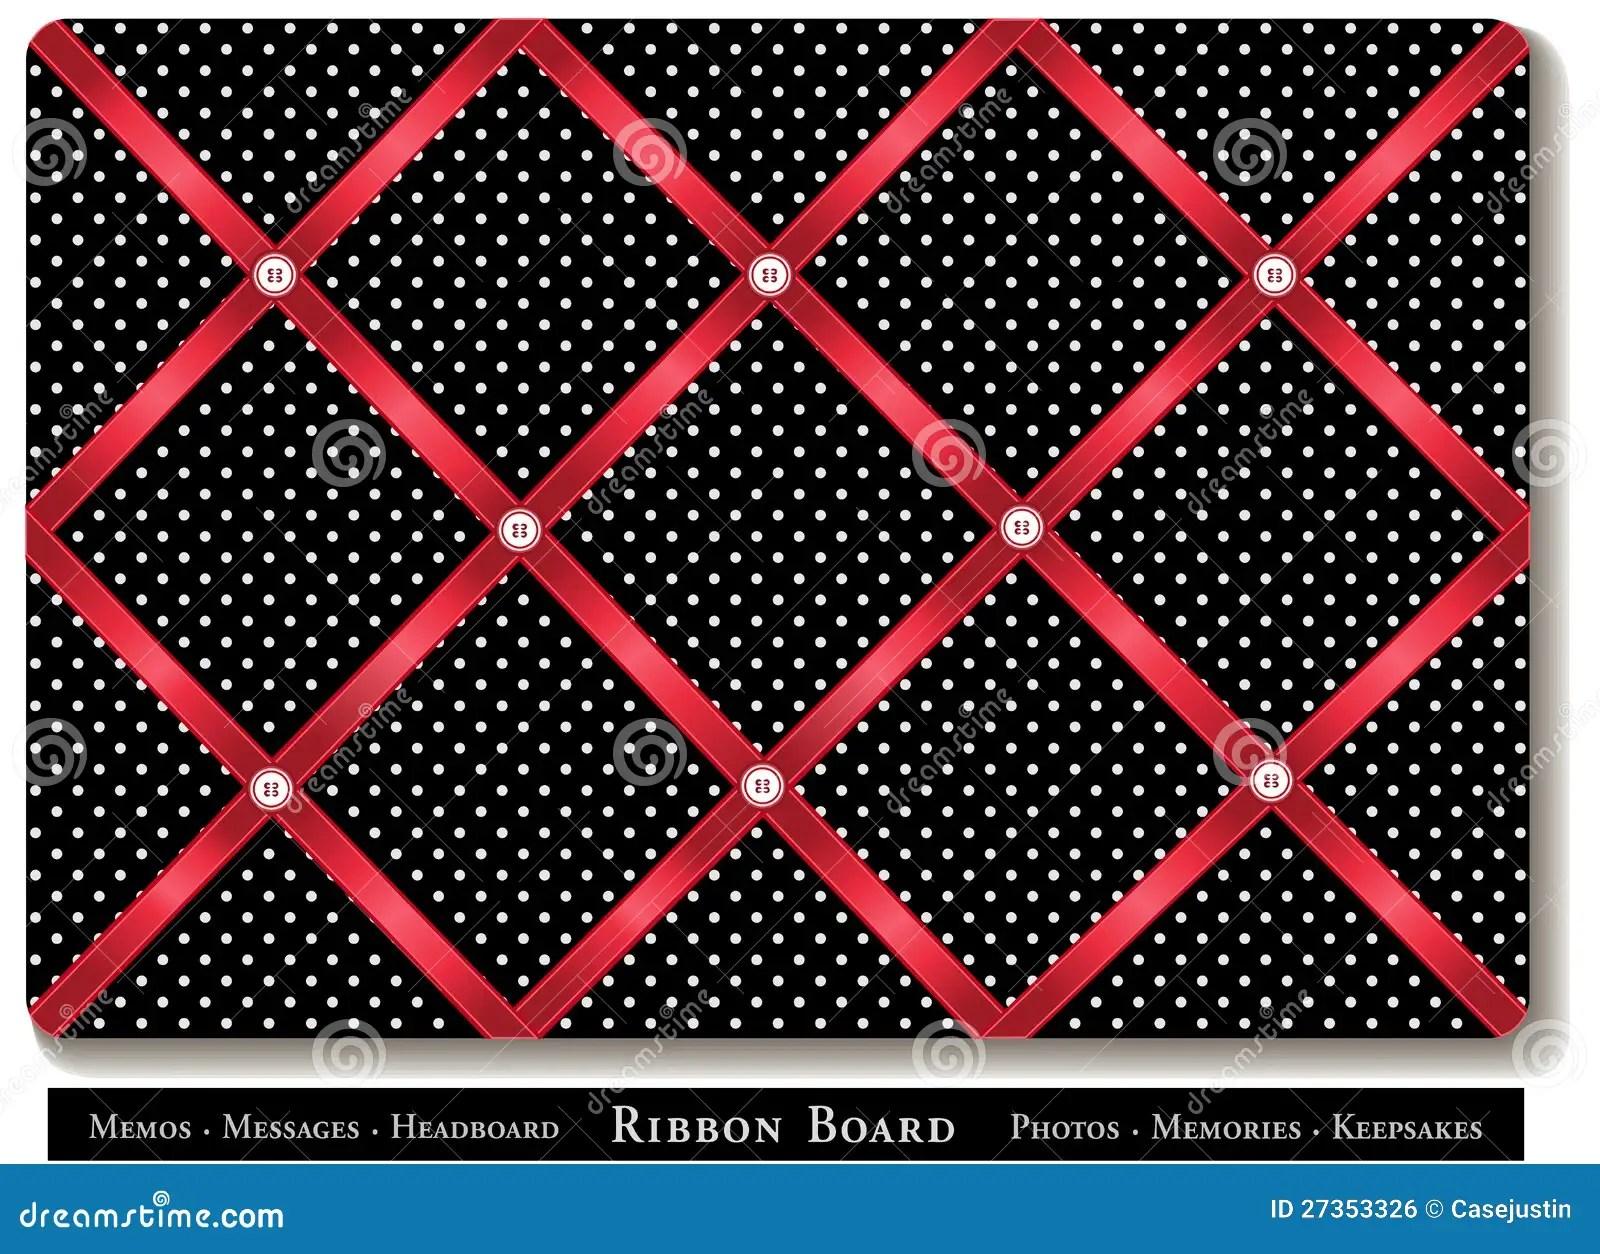 Ribbon Bulletin Board Stock Vector Image Of Cross